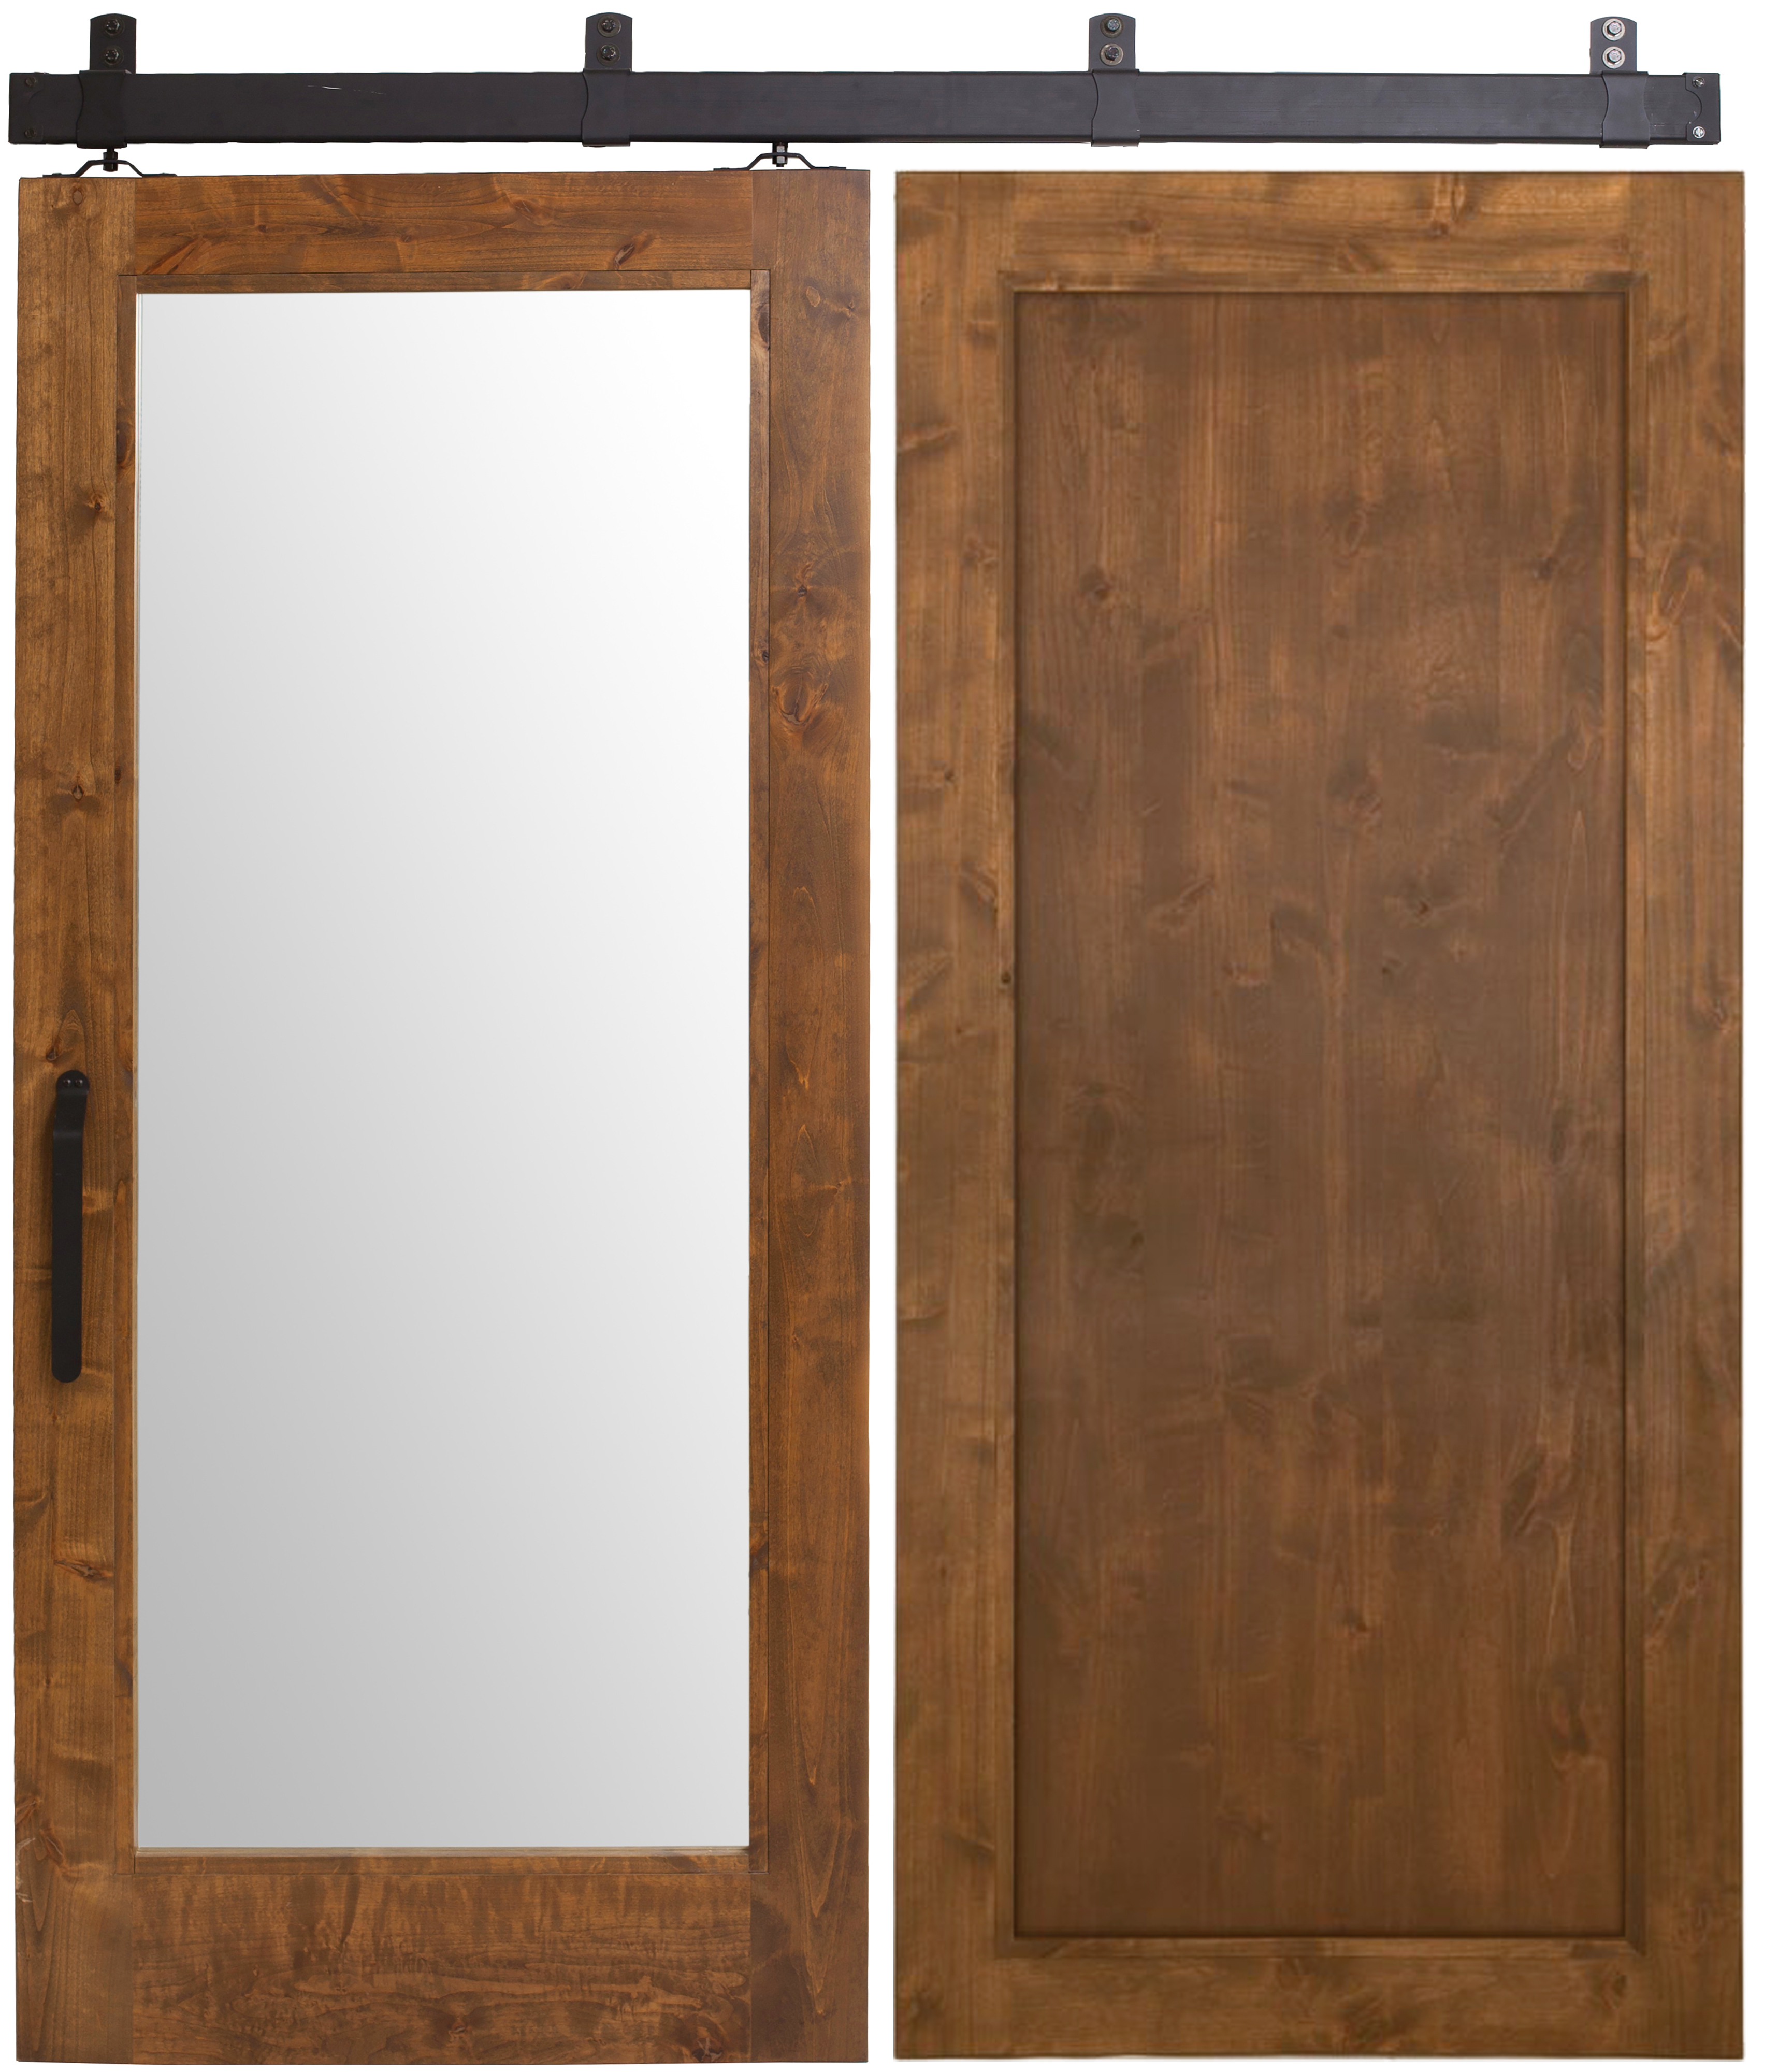 Mirror Barn Door  Rustica